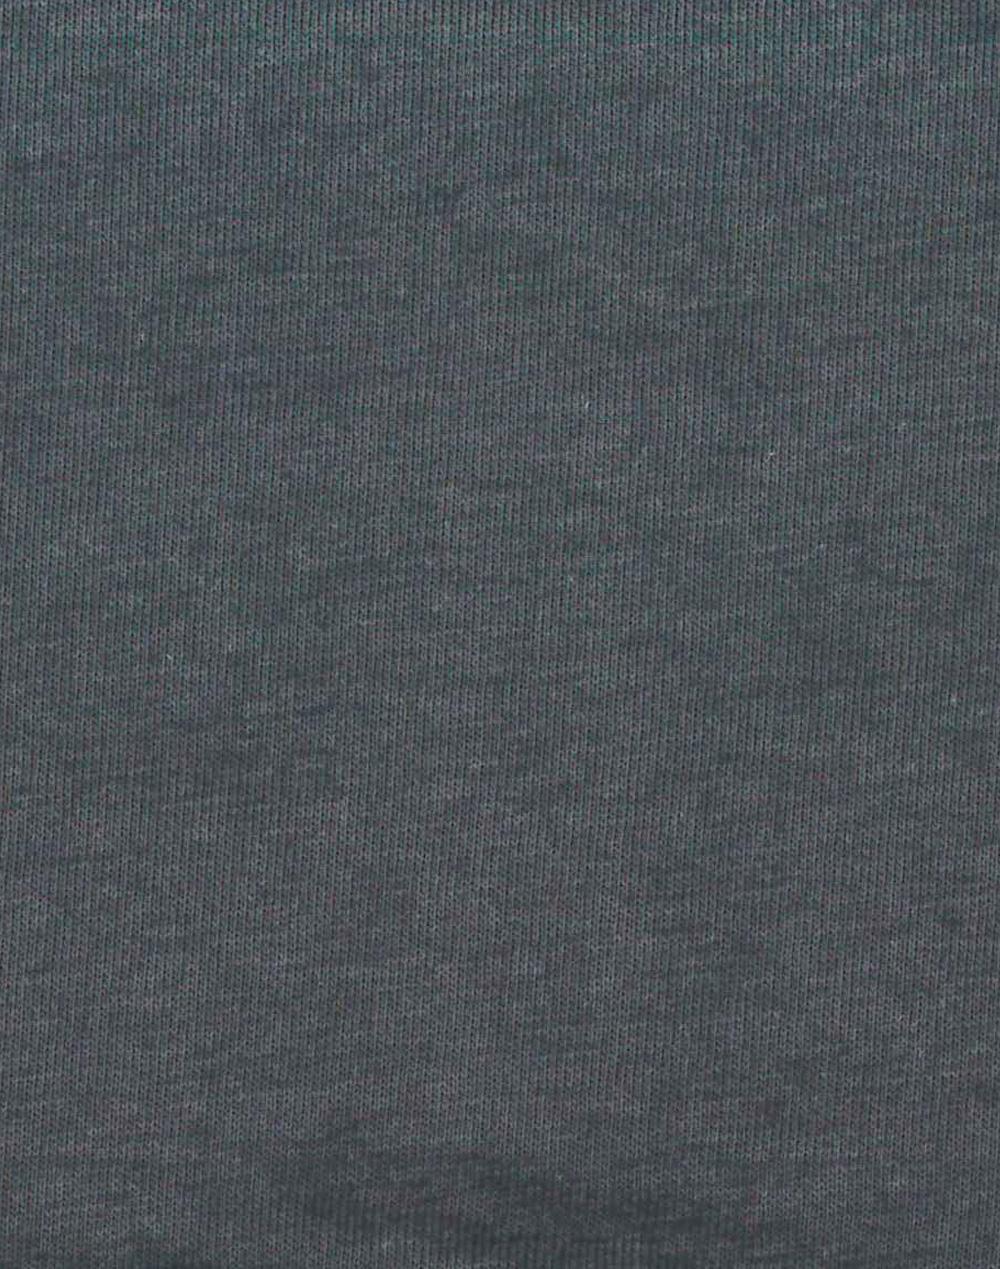 https://ws-imgs.s3-ap-southeast-1.amazonaws.com/TEESHIRTS/TS41-42_Fabric.jpg